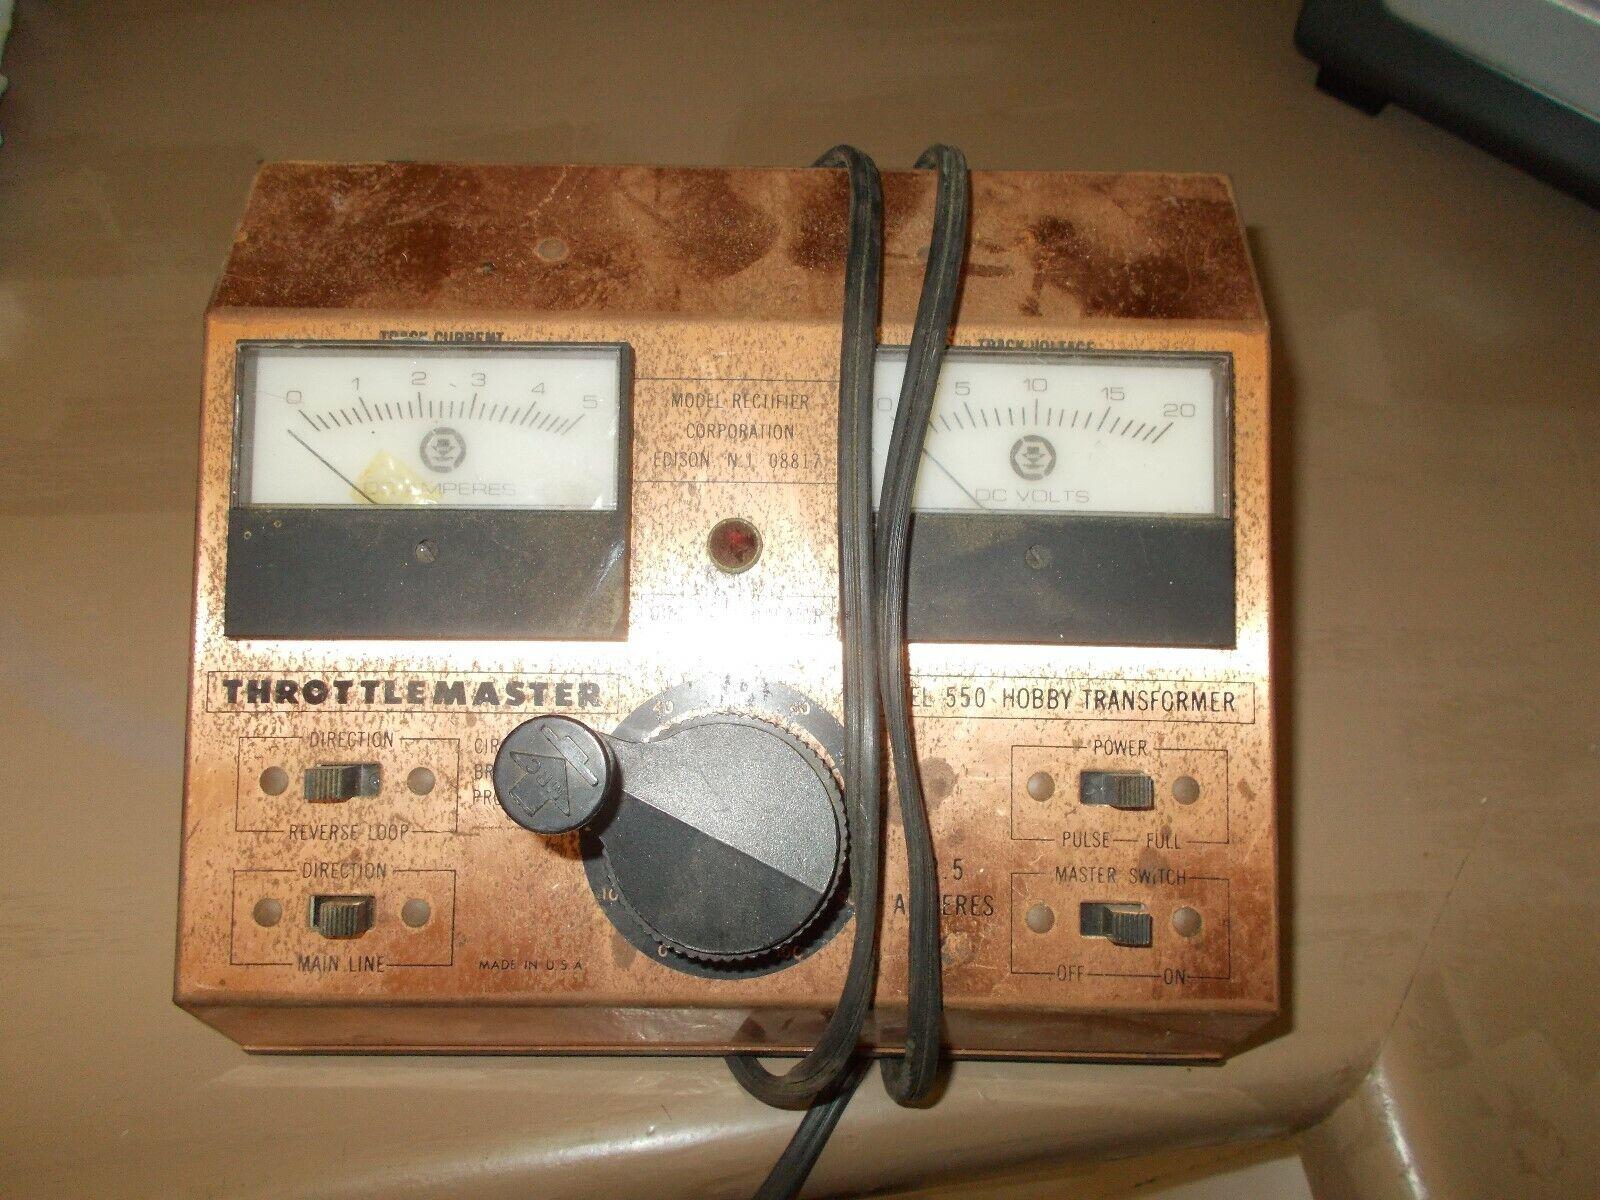 Transformador throjotlemaster Modelo 550 Hobby